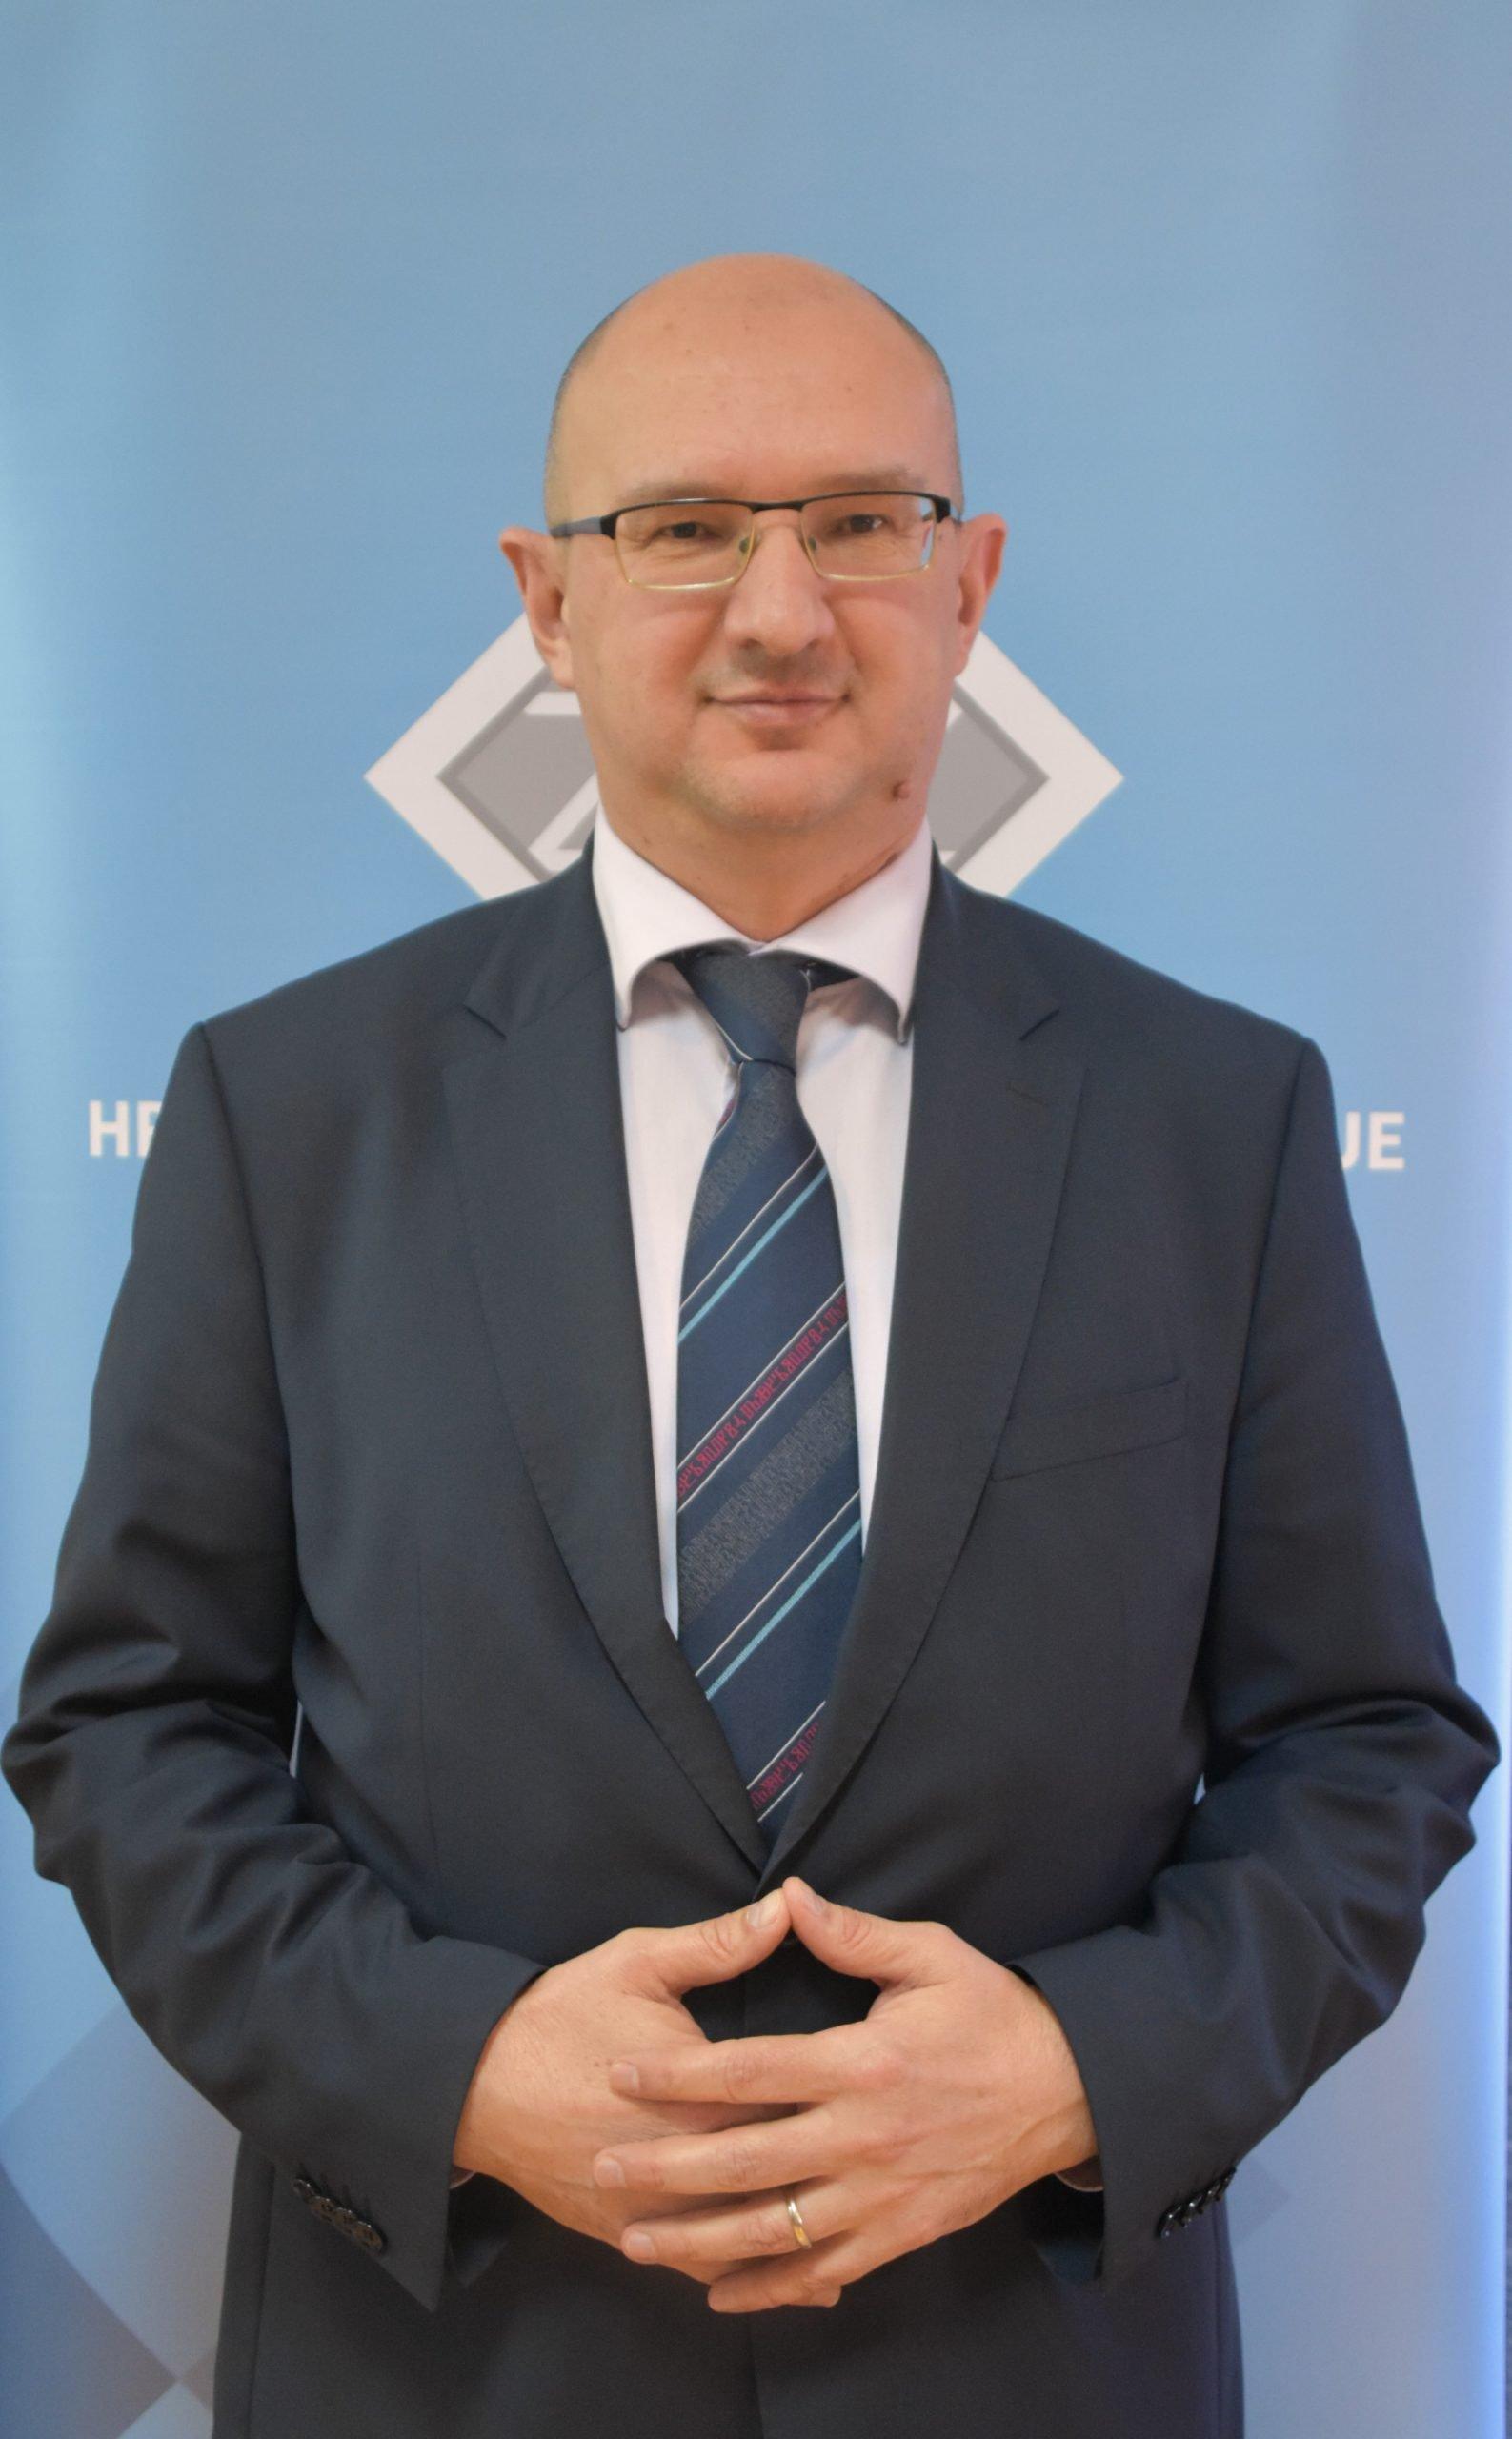 Hrvatska - Ante Lončar